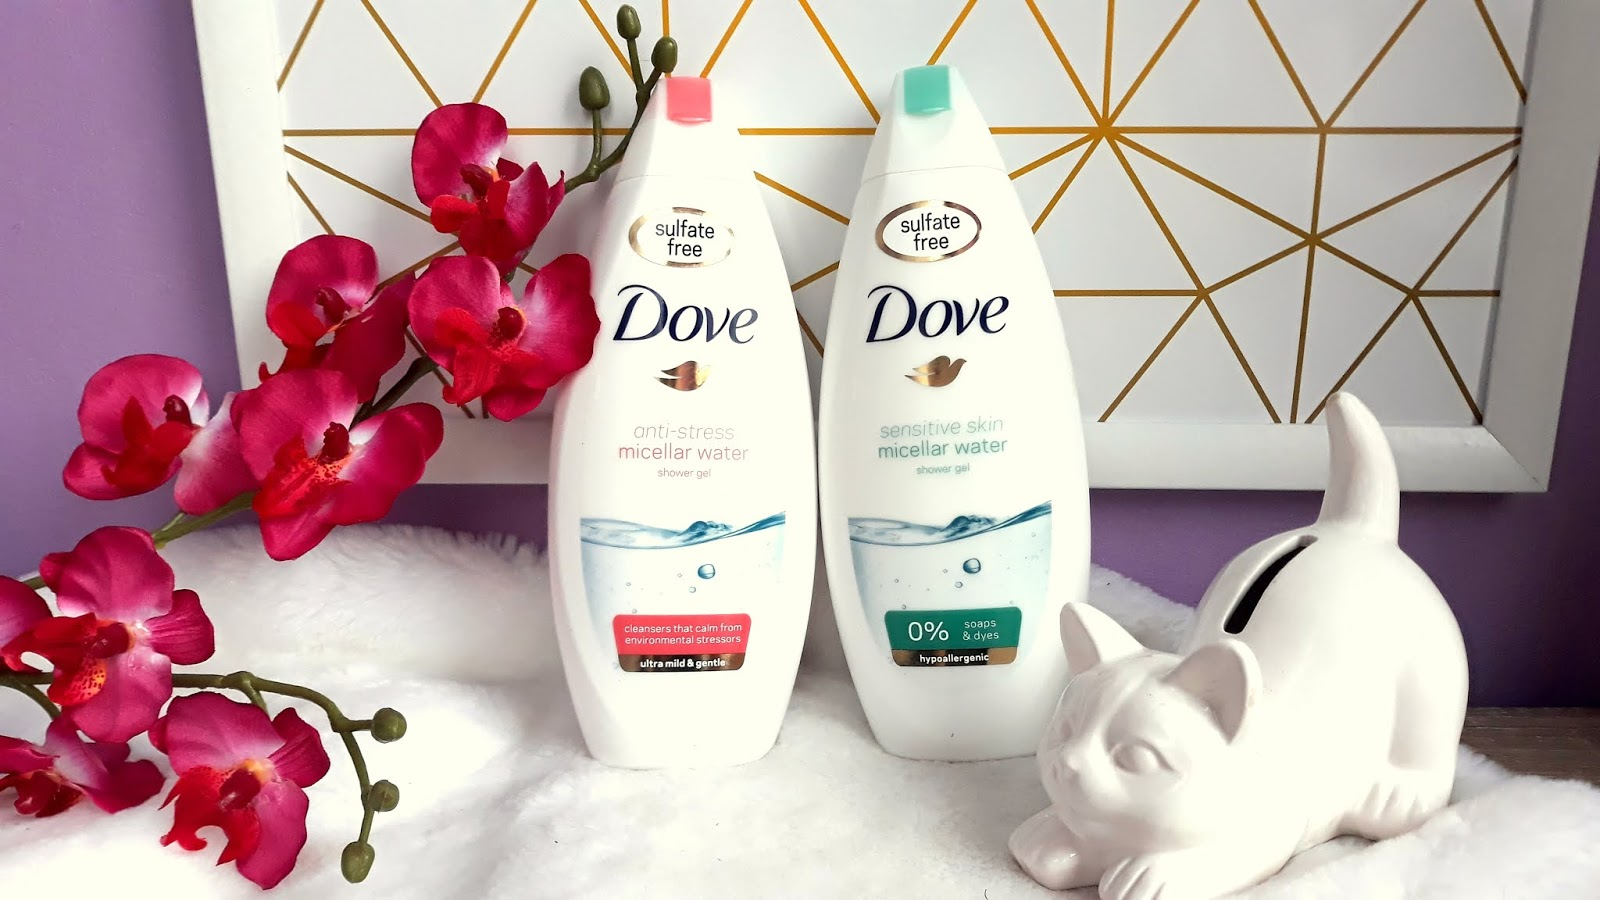 Dove Micellar Water micelarne żele pod prysznic